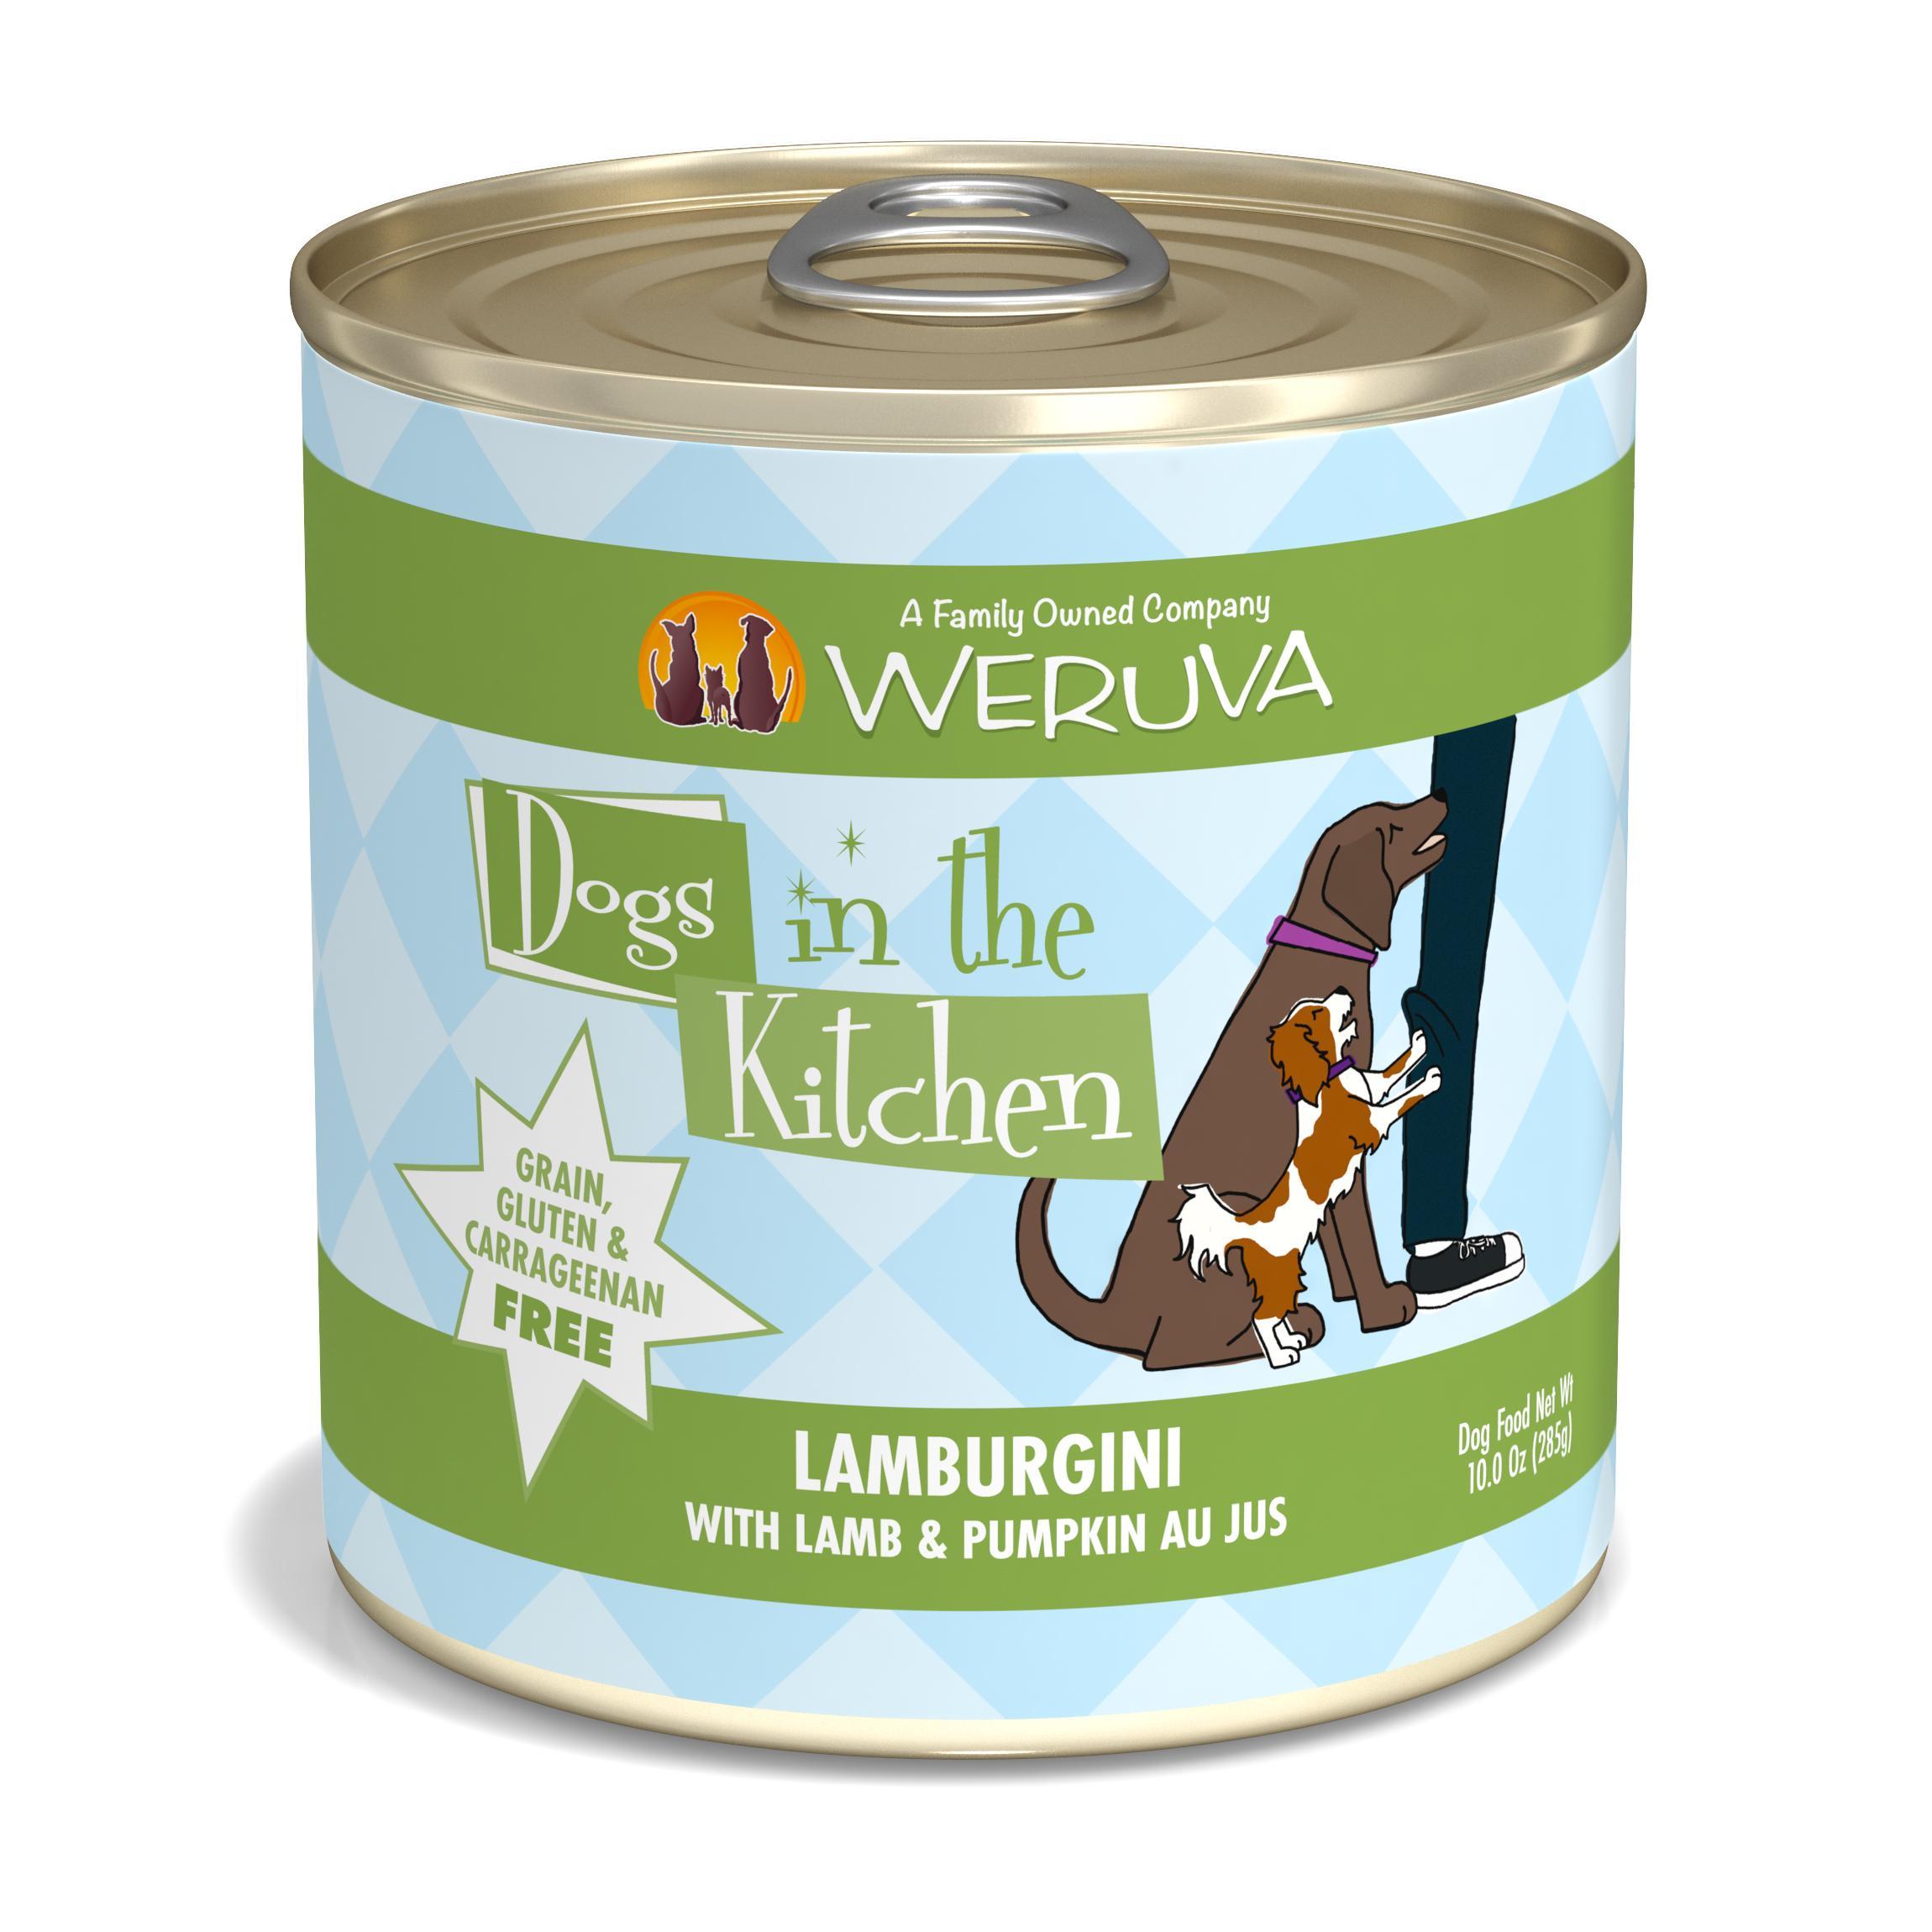 Weruva Dogs in the Kitchen Lamburgini with Lamb & Pumpkin Au Jus Grain-Free Wet Dog Food, 10-oz can